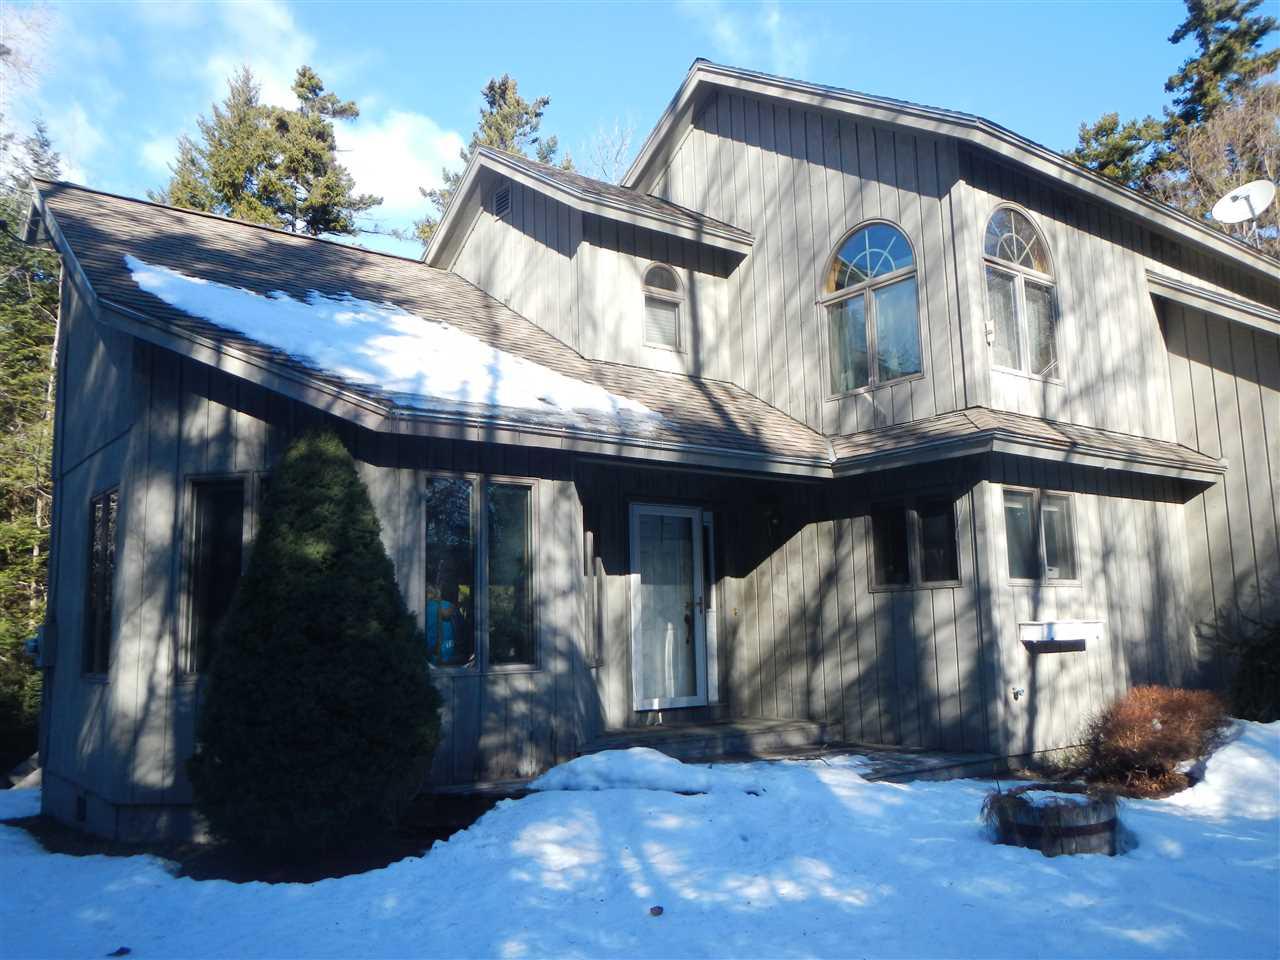 Mount-Snow-Real-Estate-4614310-21